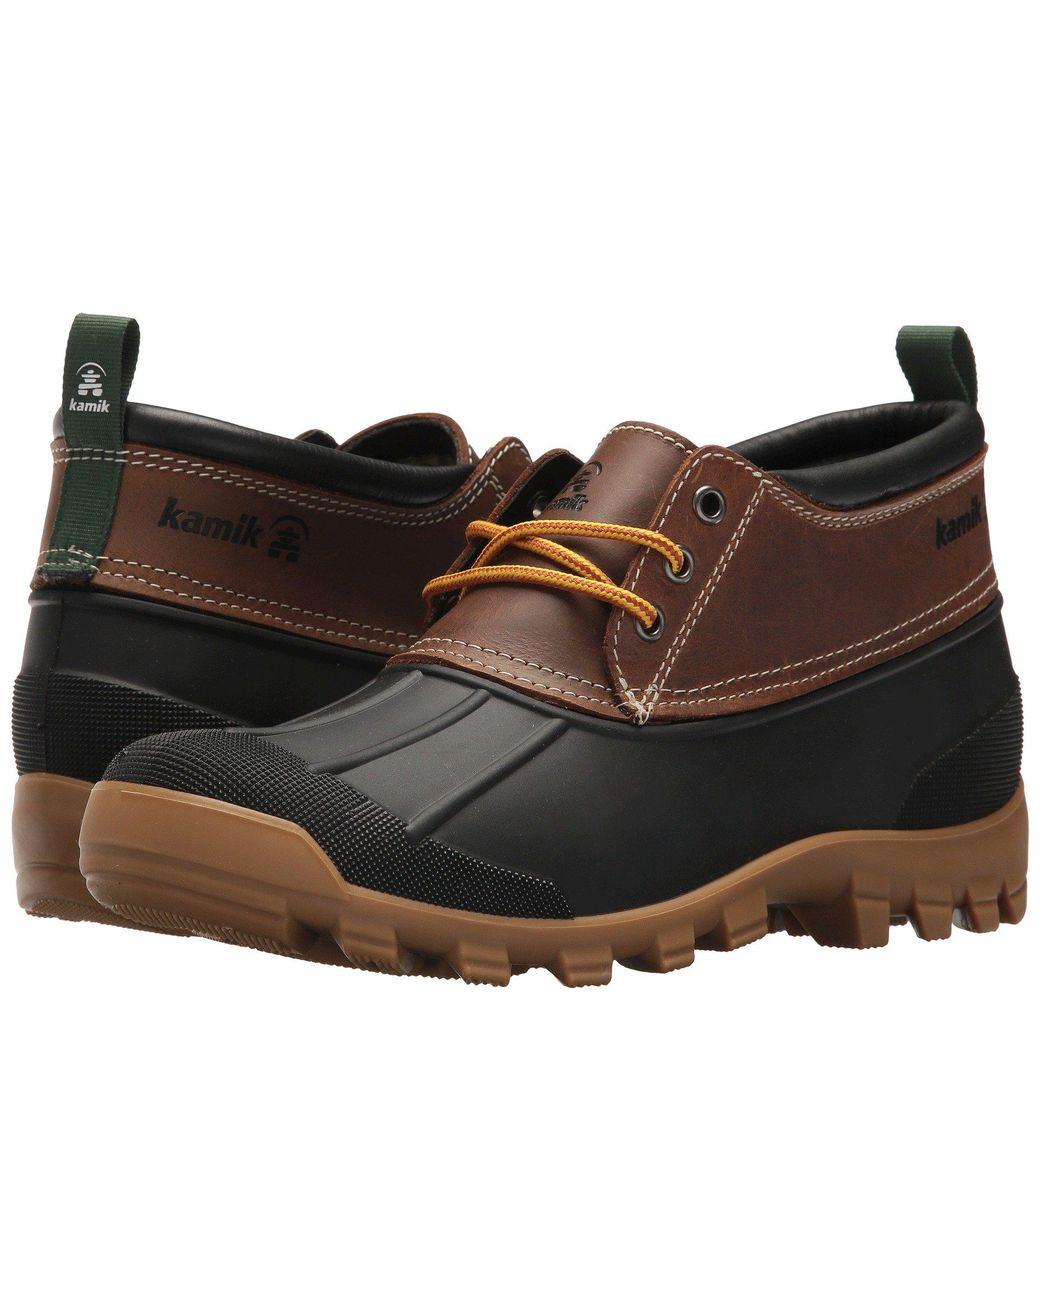 Kamik Leather Yukon 3 in Brown for Men